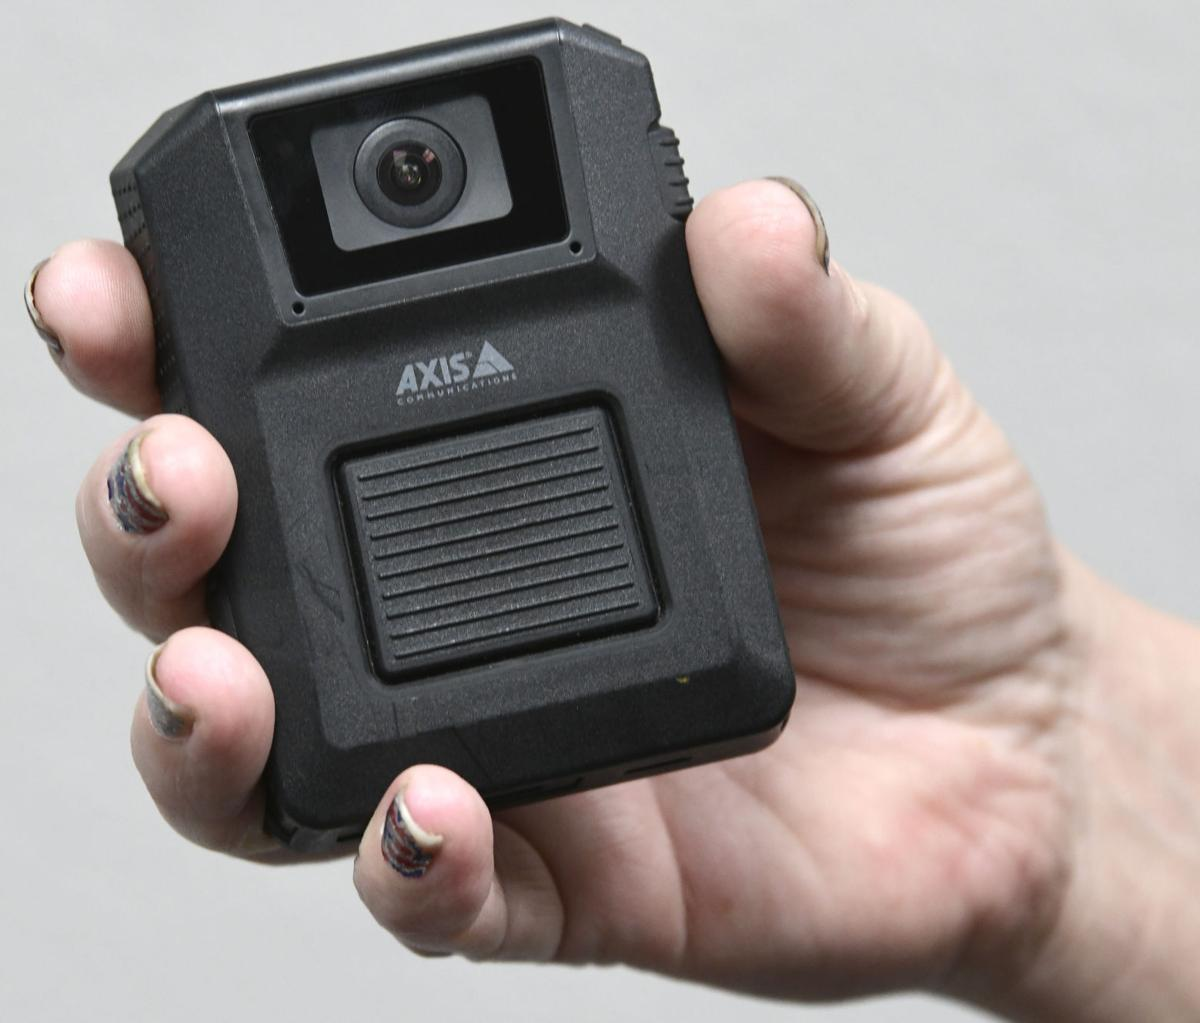 070921-nws-body-camera-2